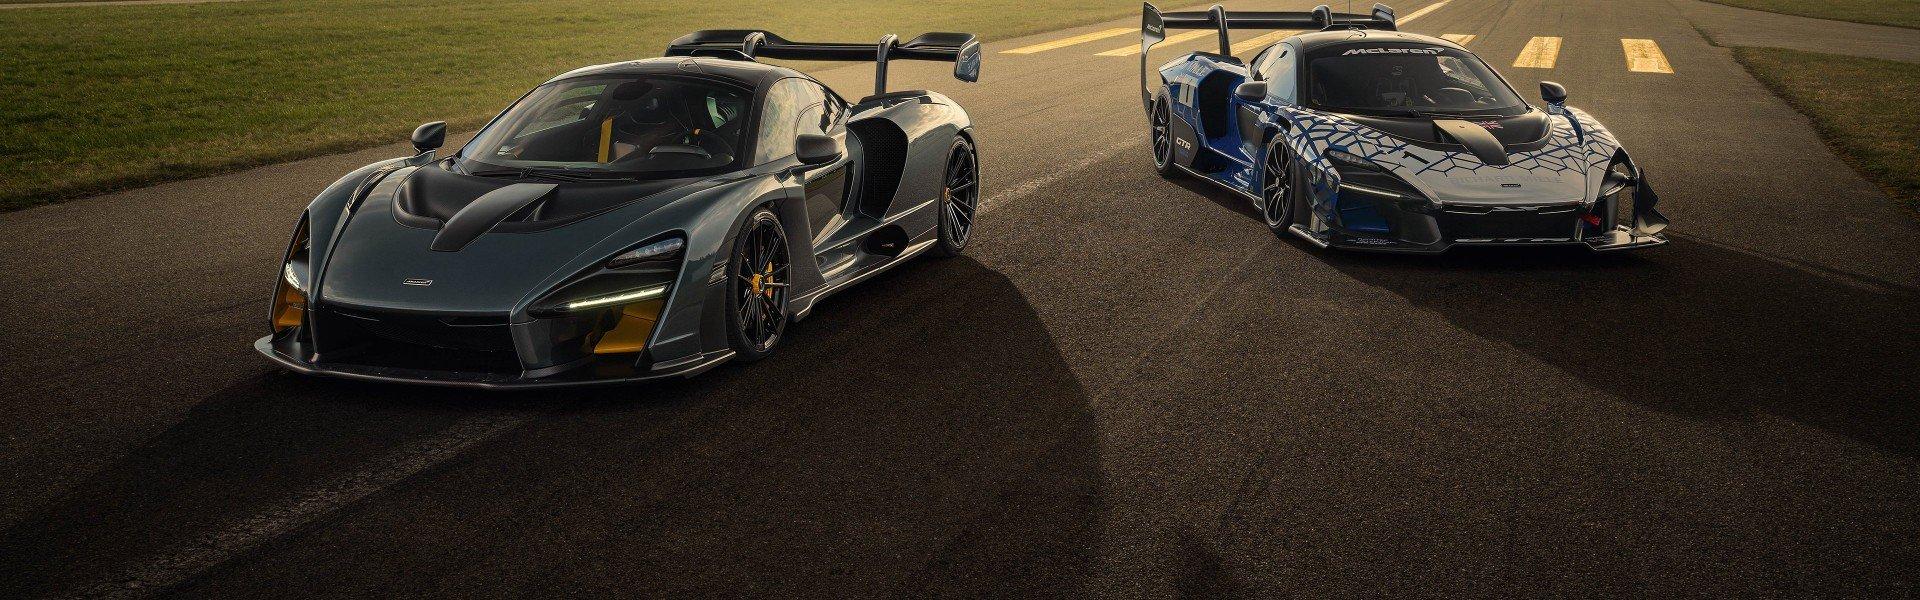 McLaren Mendapat Tenaga Tambahan Dari Novitec